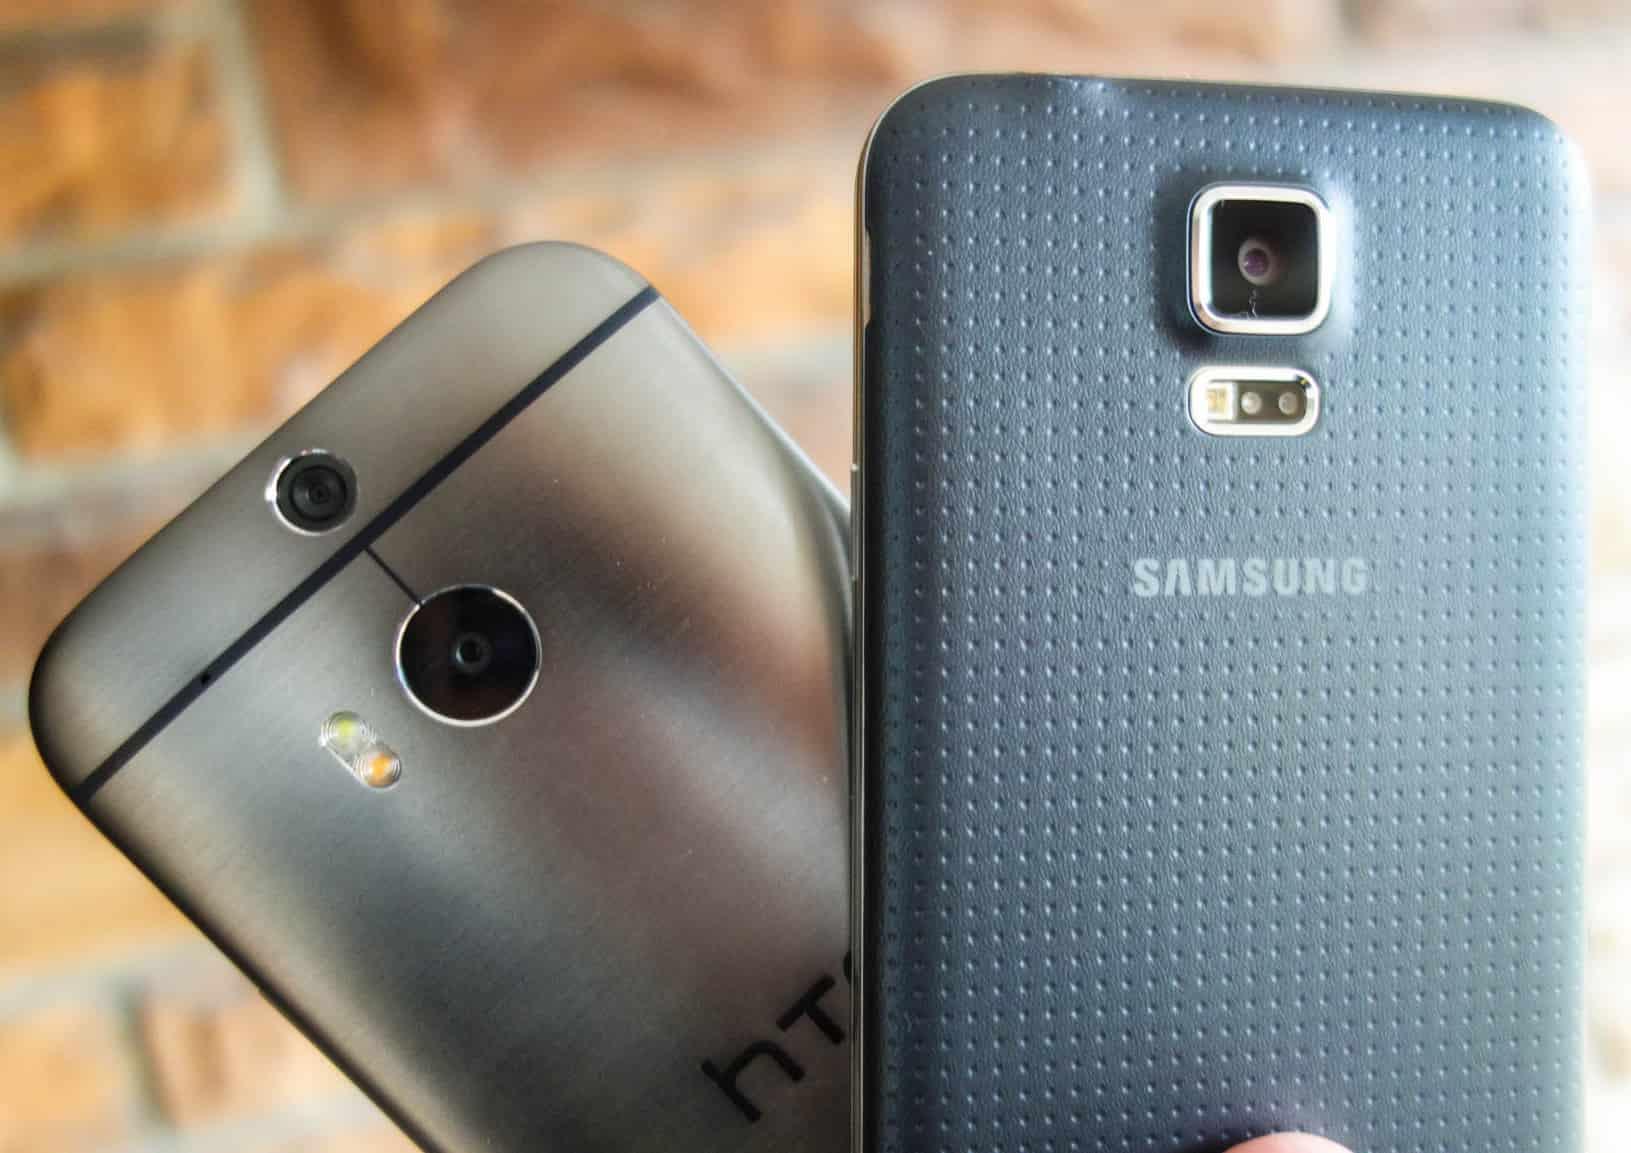 Older Cell Phone Cameras